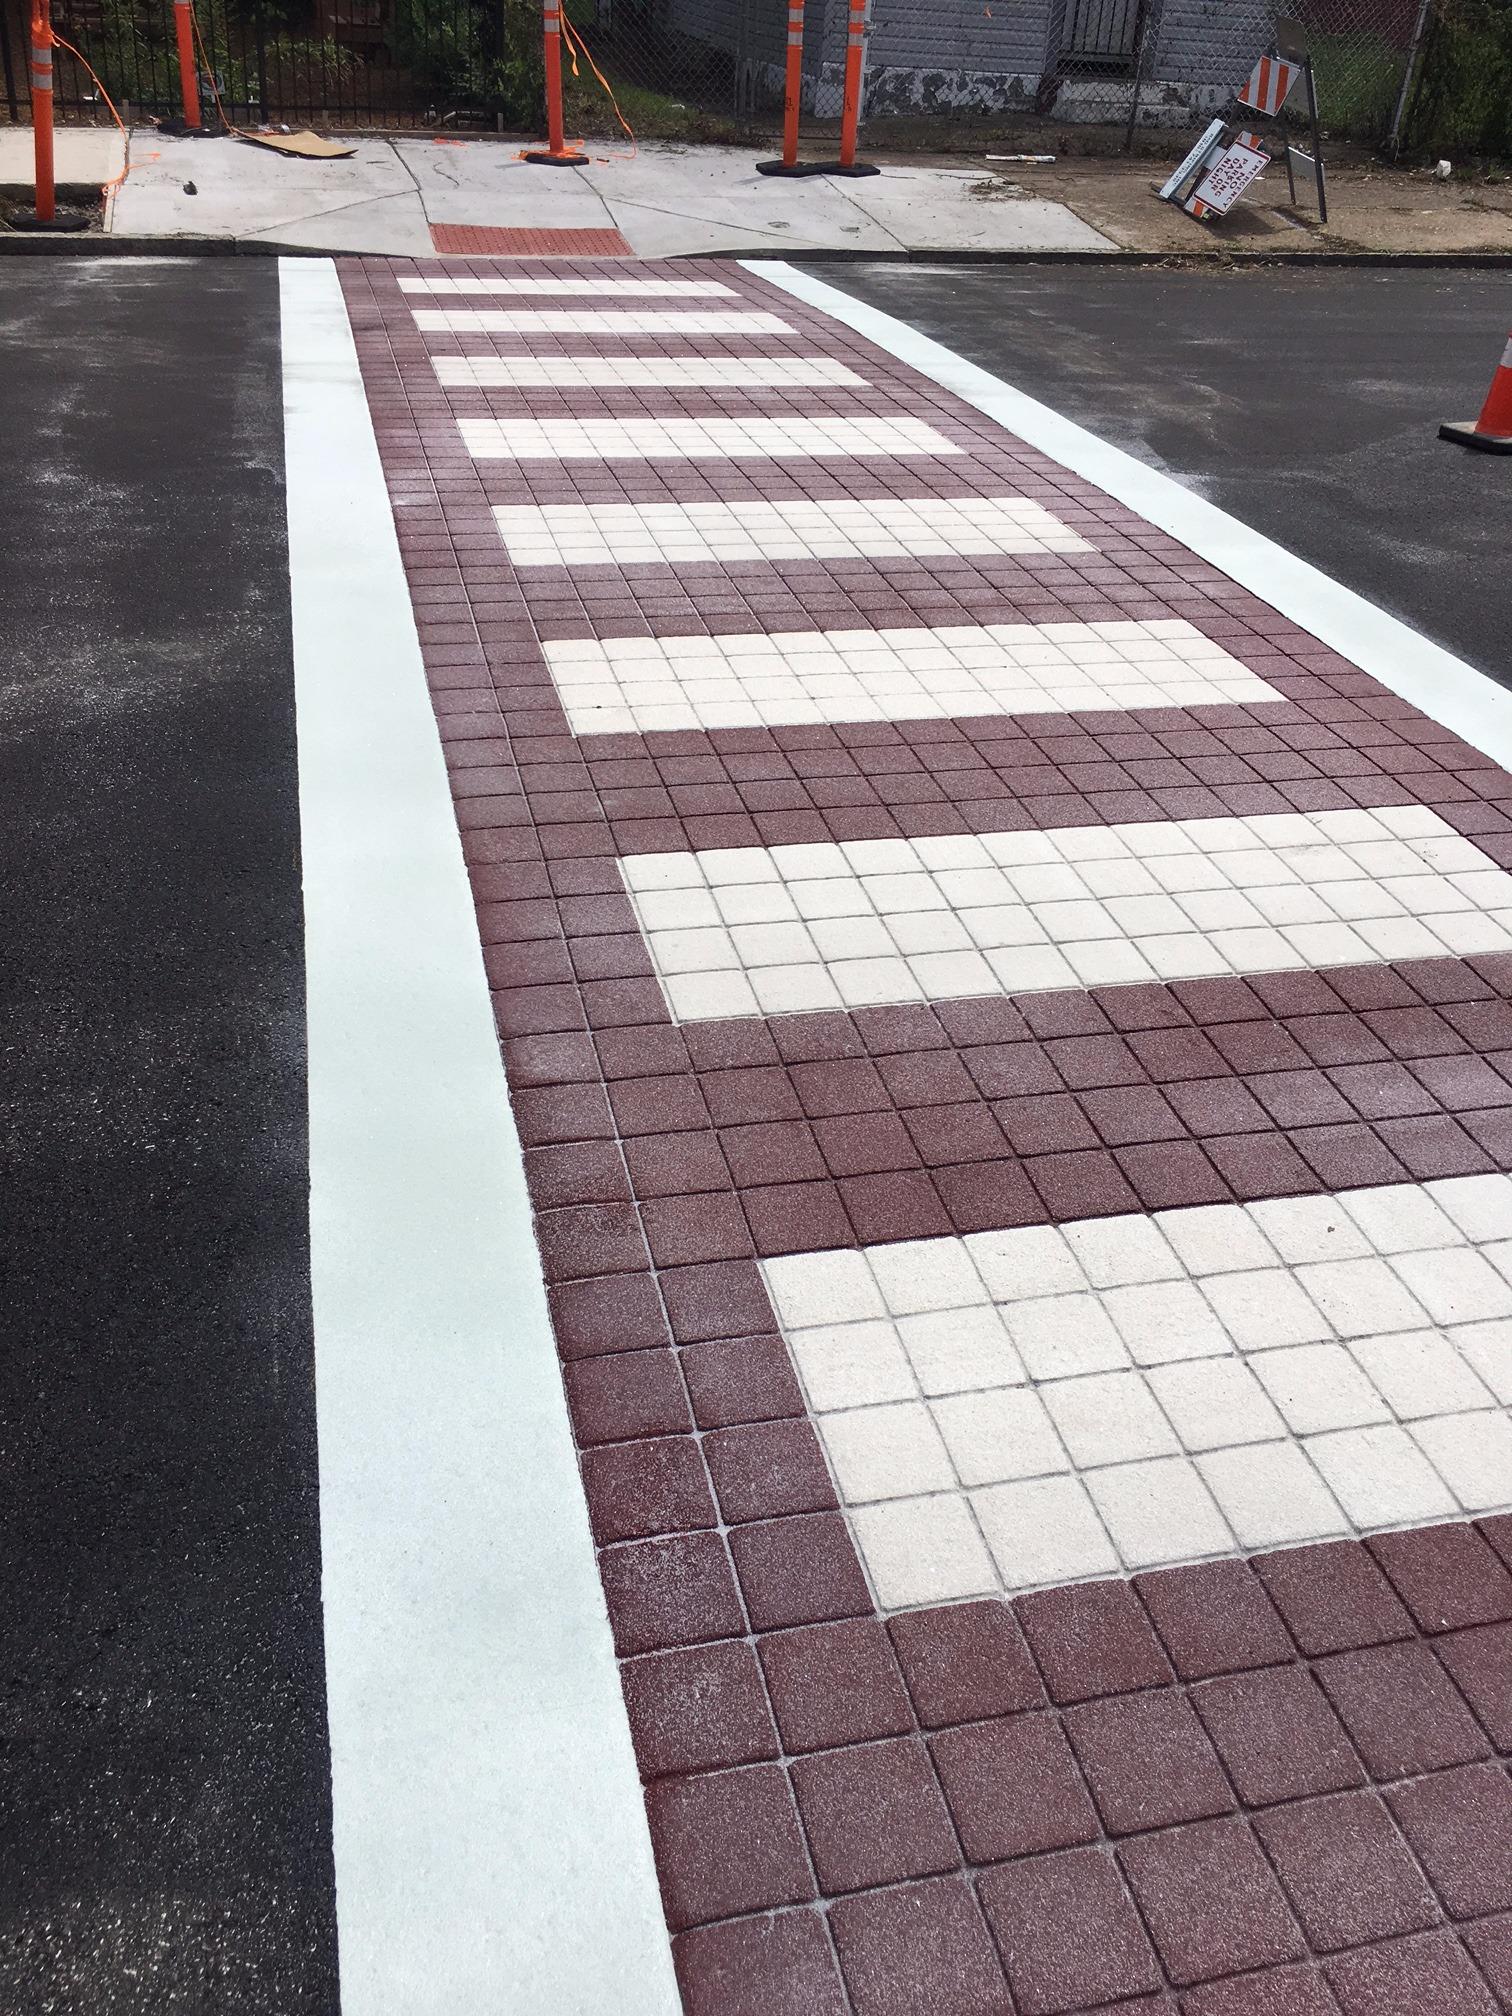 Decorative-Crosswalk-2.jpg